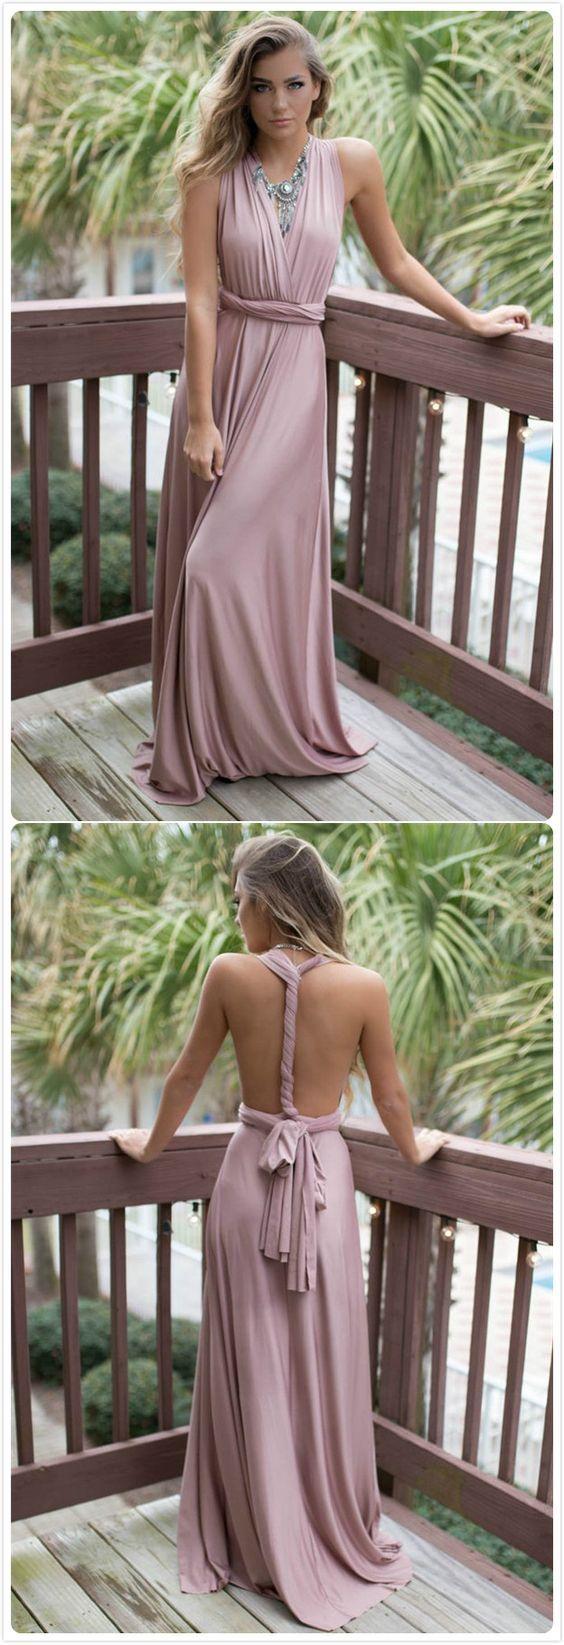 Women's Sleeveless Backless Solid Long Prom Dress